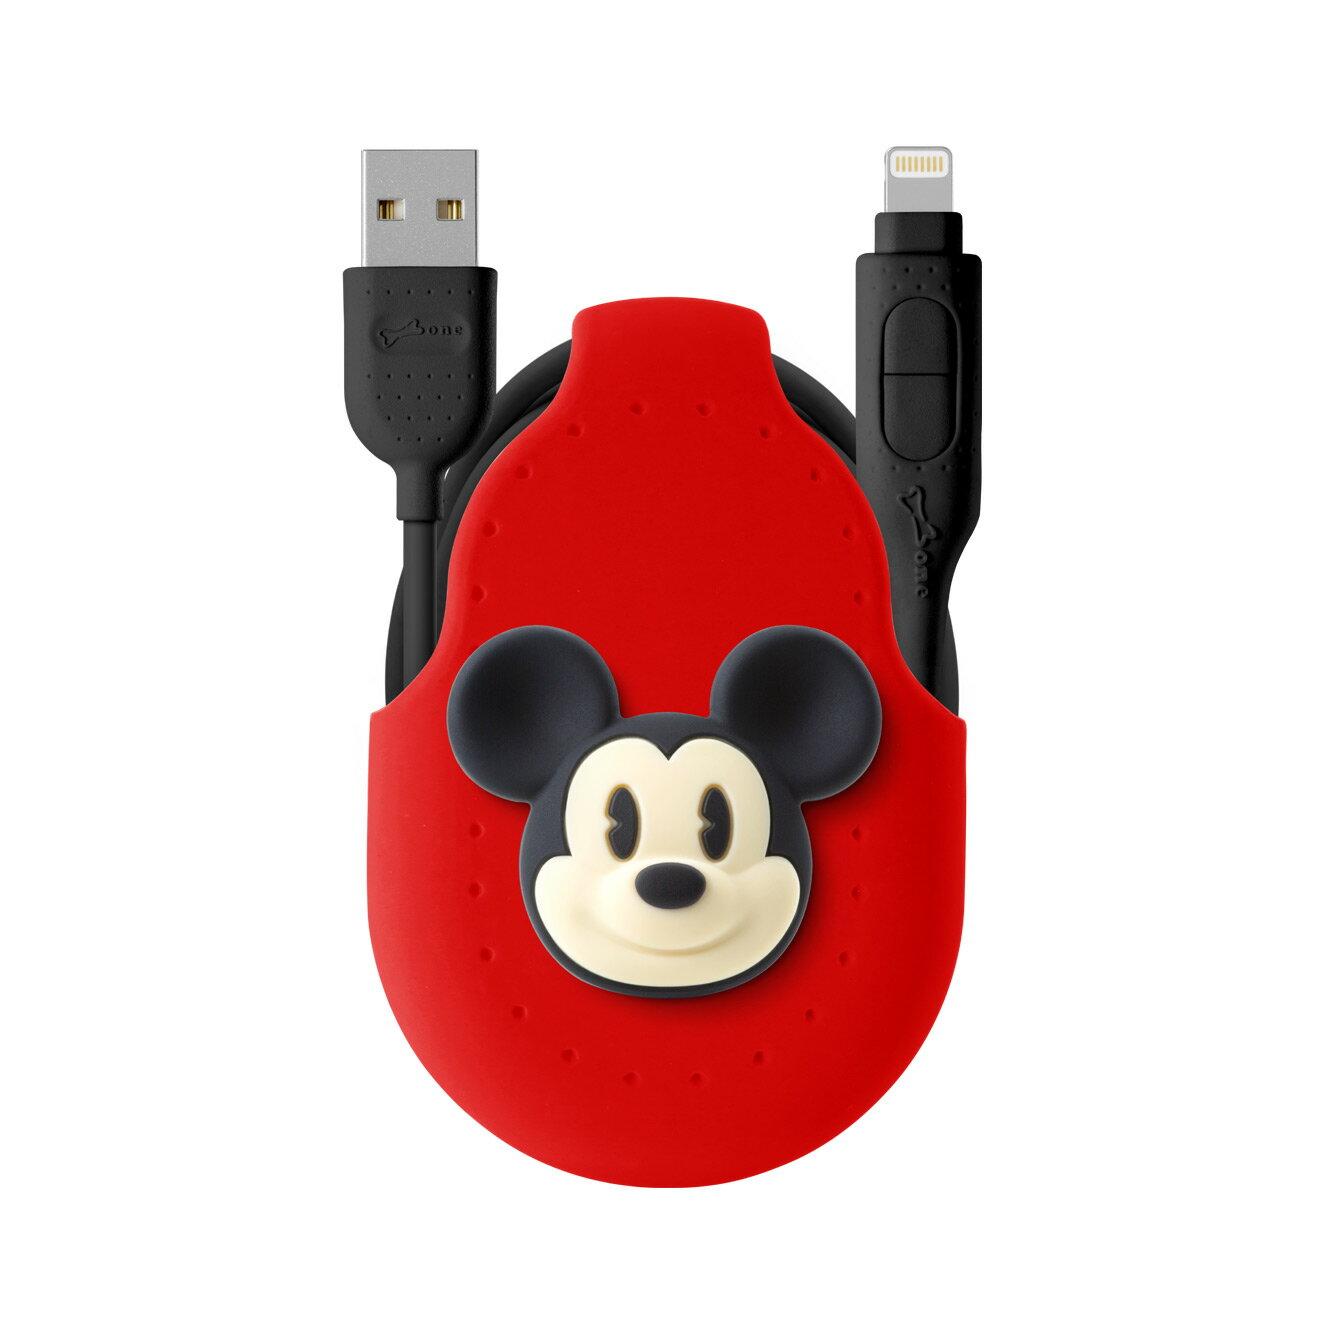 Bone 二合一雙頭傳輸線 - 米奇 迪士尼 Disney 支援快充 充電線 兩用線 Android APPLE官方認證 iPhone